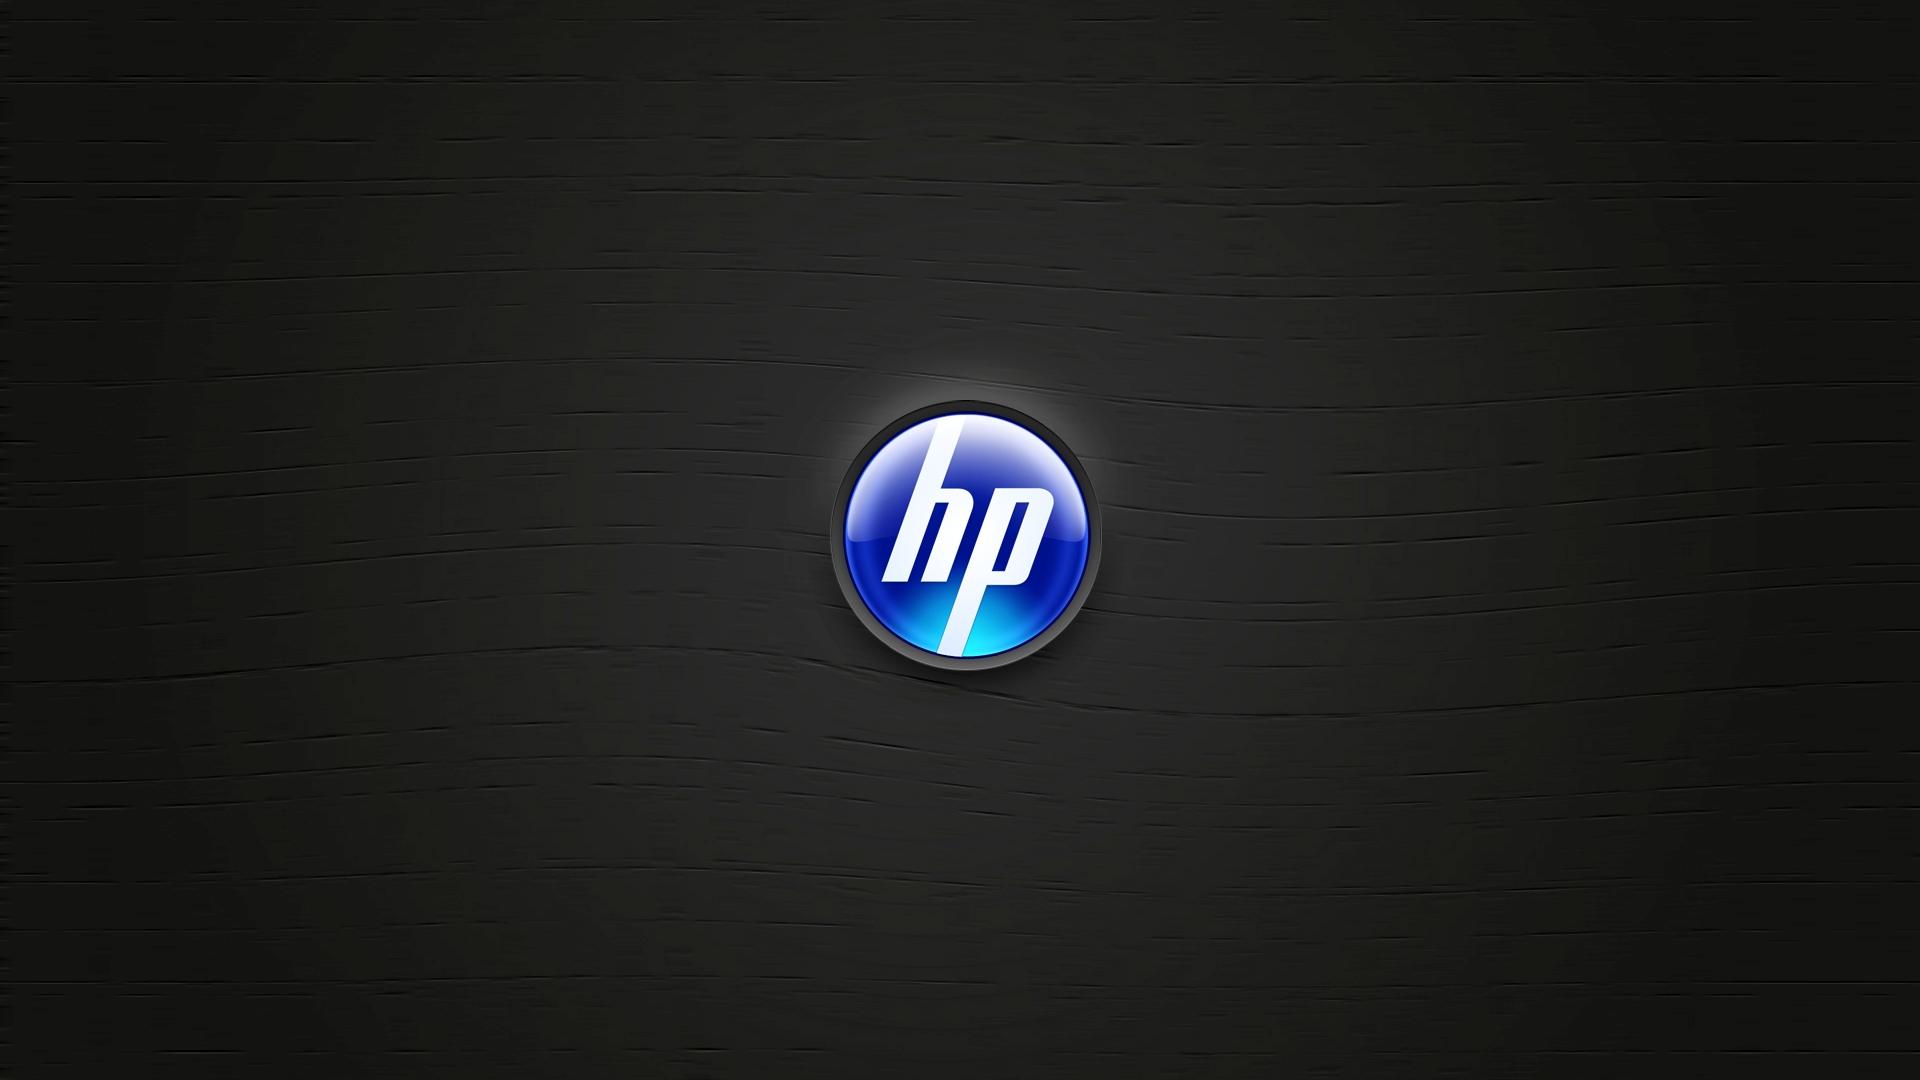 1920x1080px hd wallpapers for hp laptop wallpapersafari